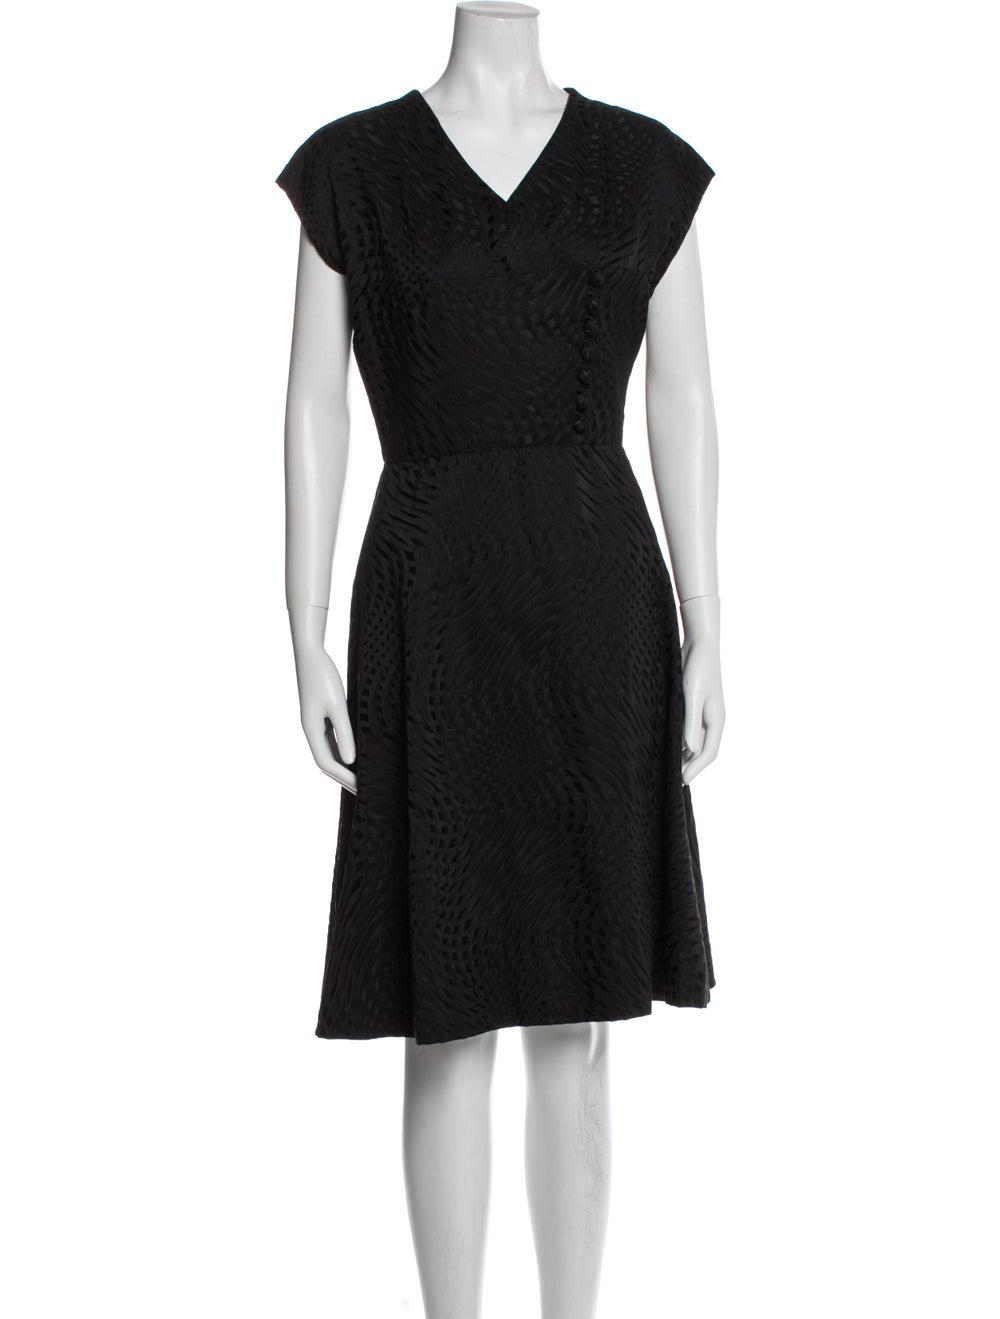 Pauline Trigere V-Neck Knee-Length Dress Black - image 1